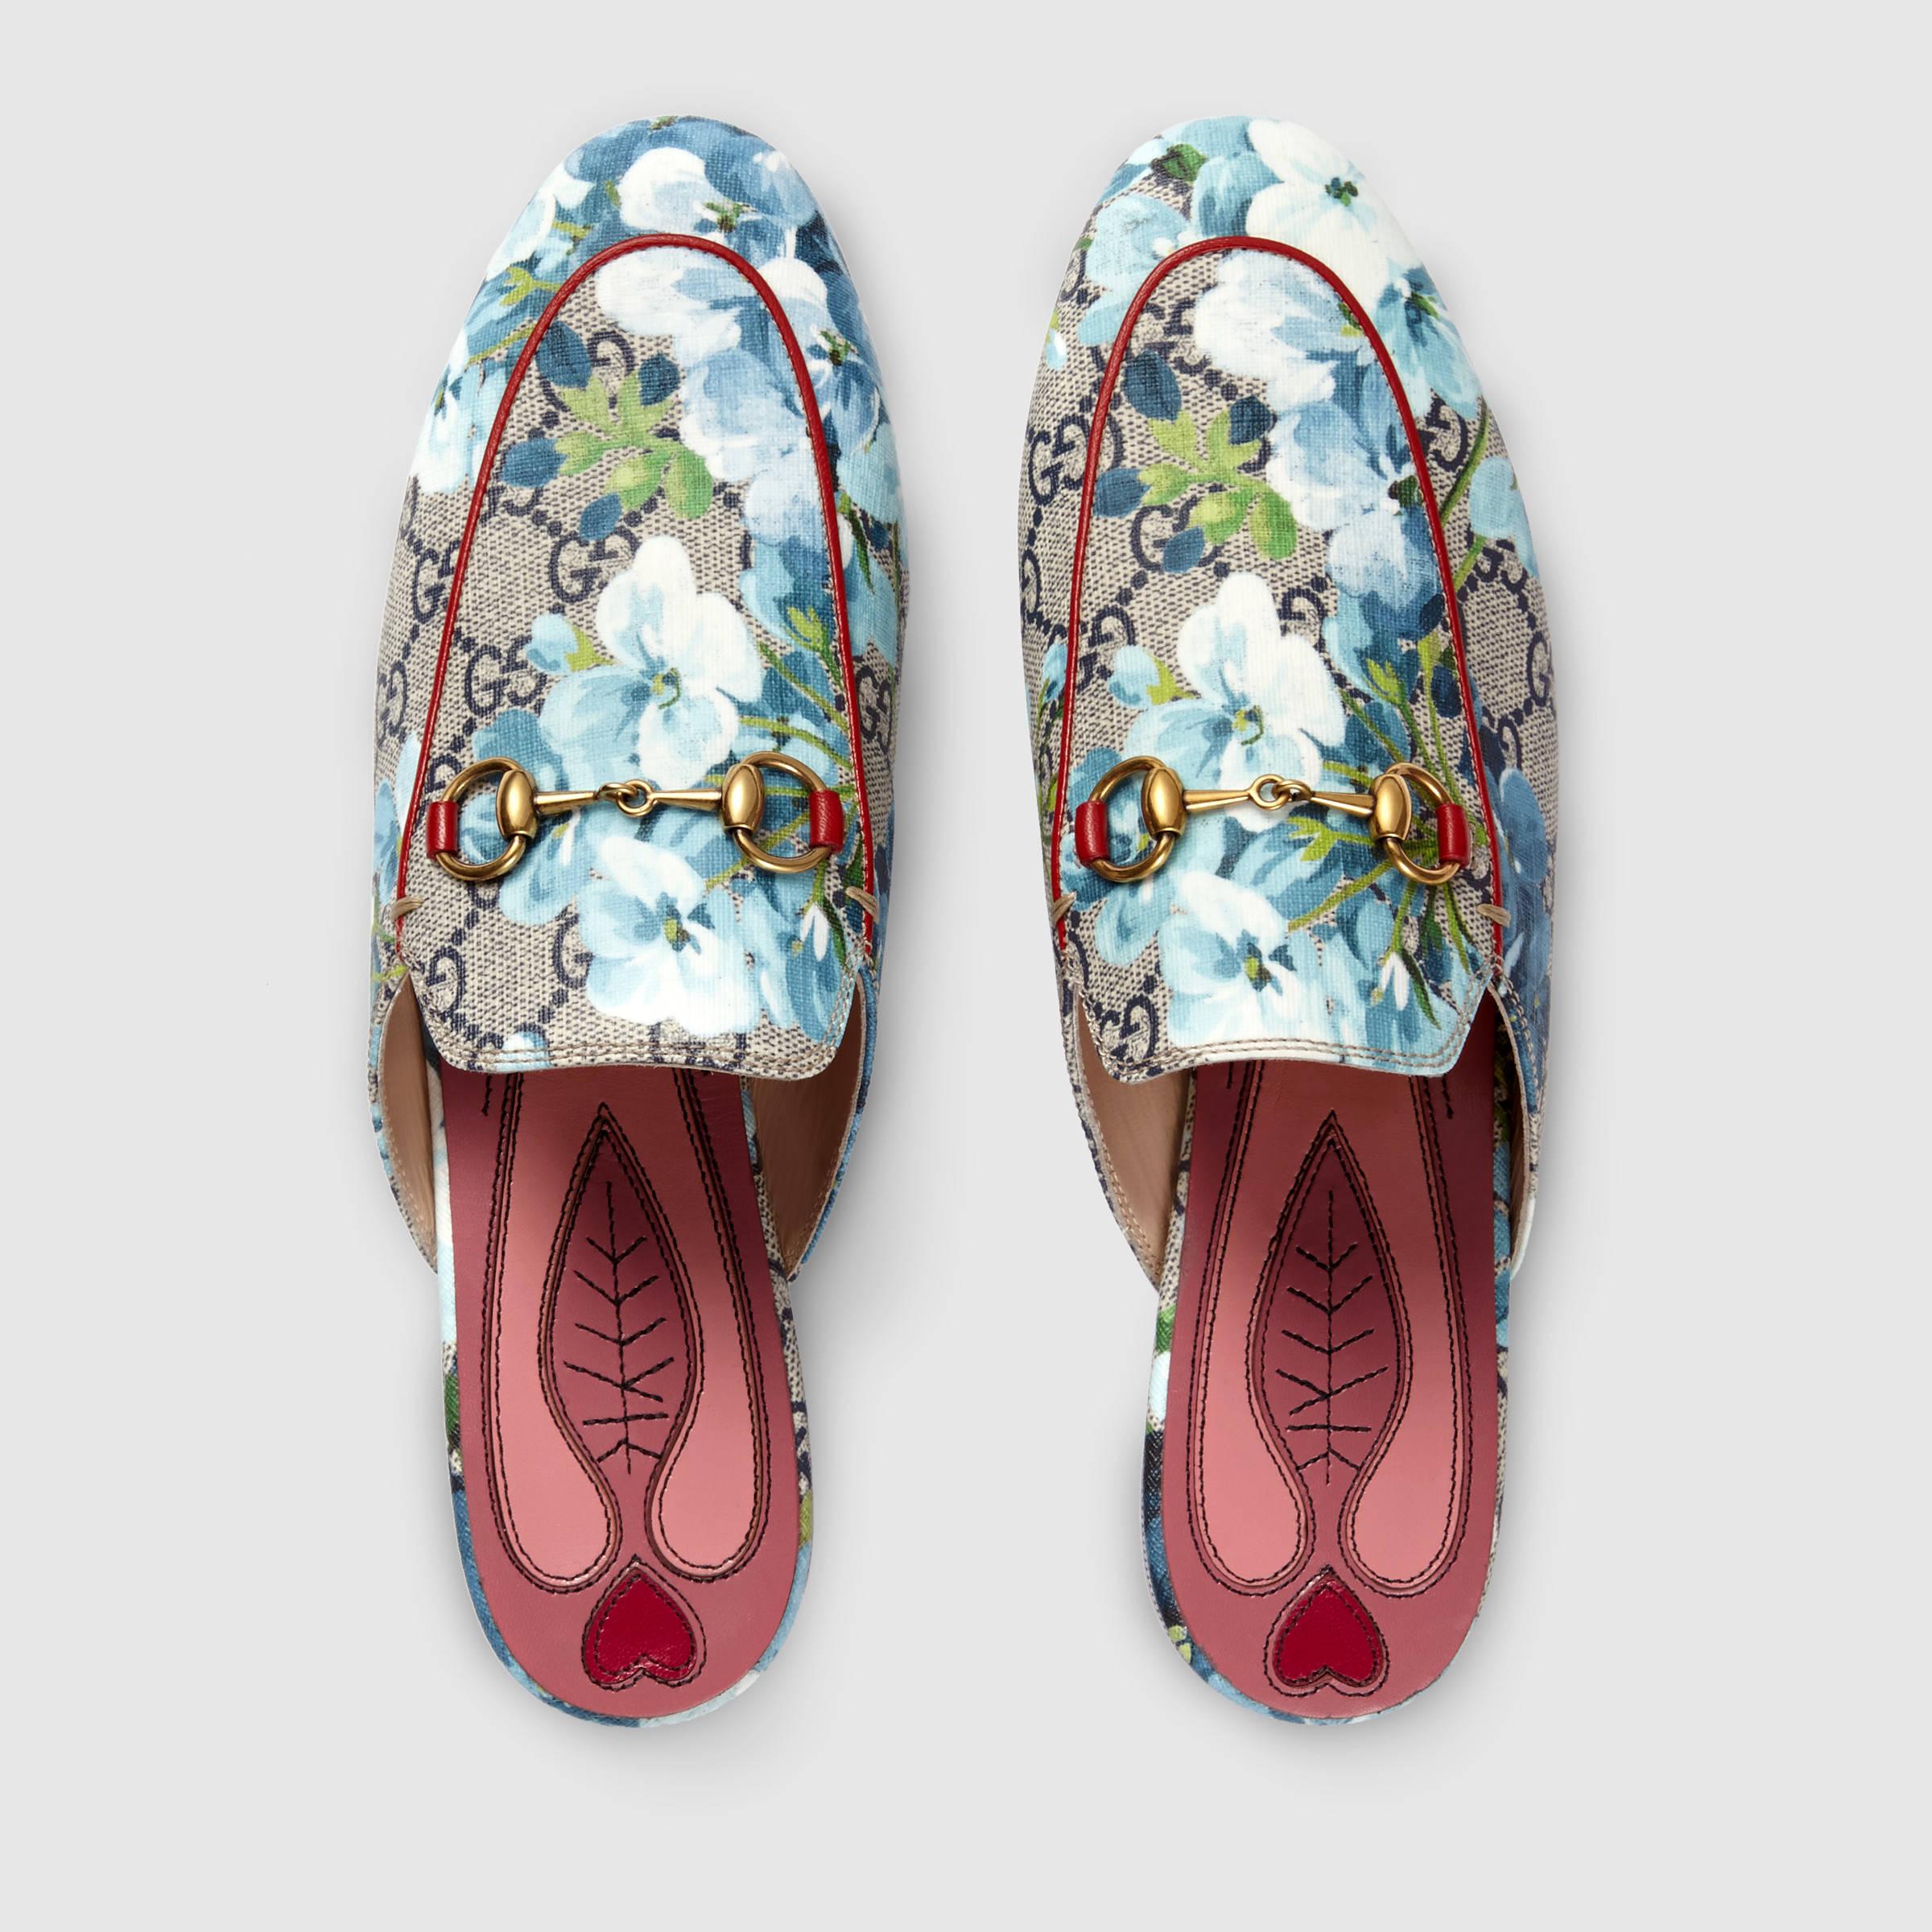 princetown-gg-blooms-slipper-695